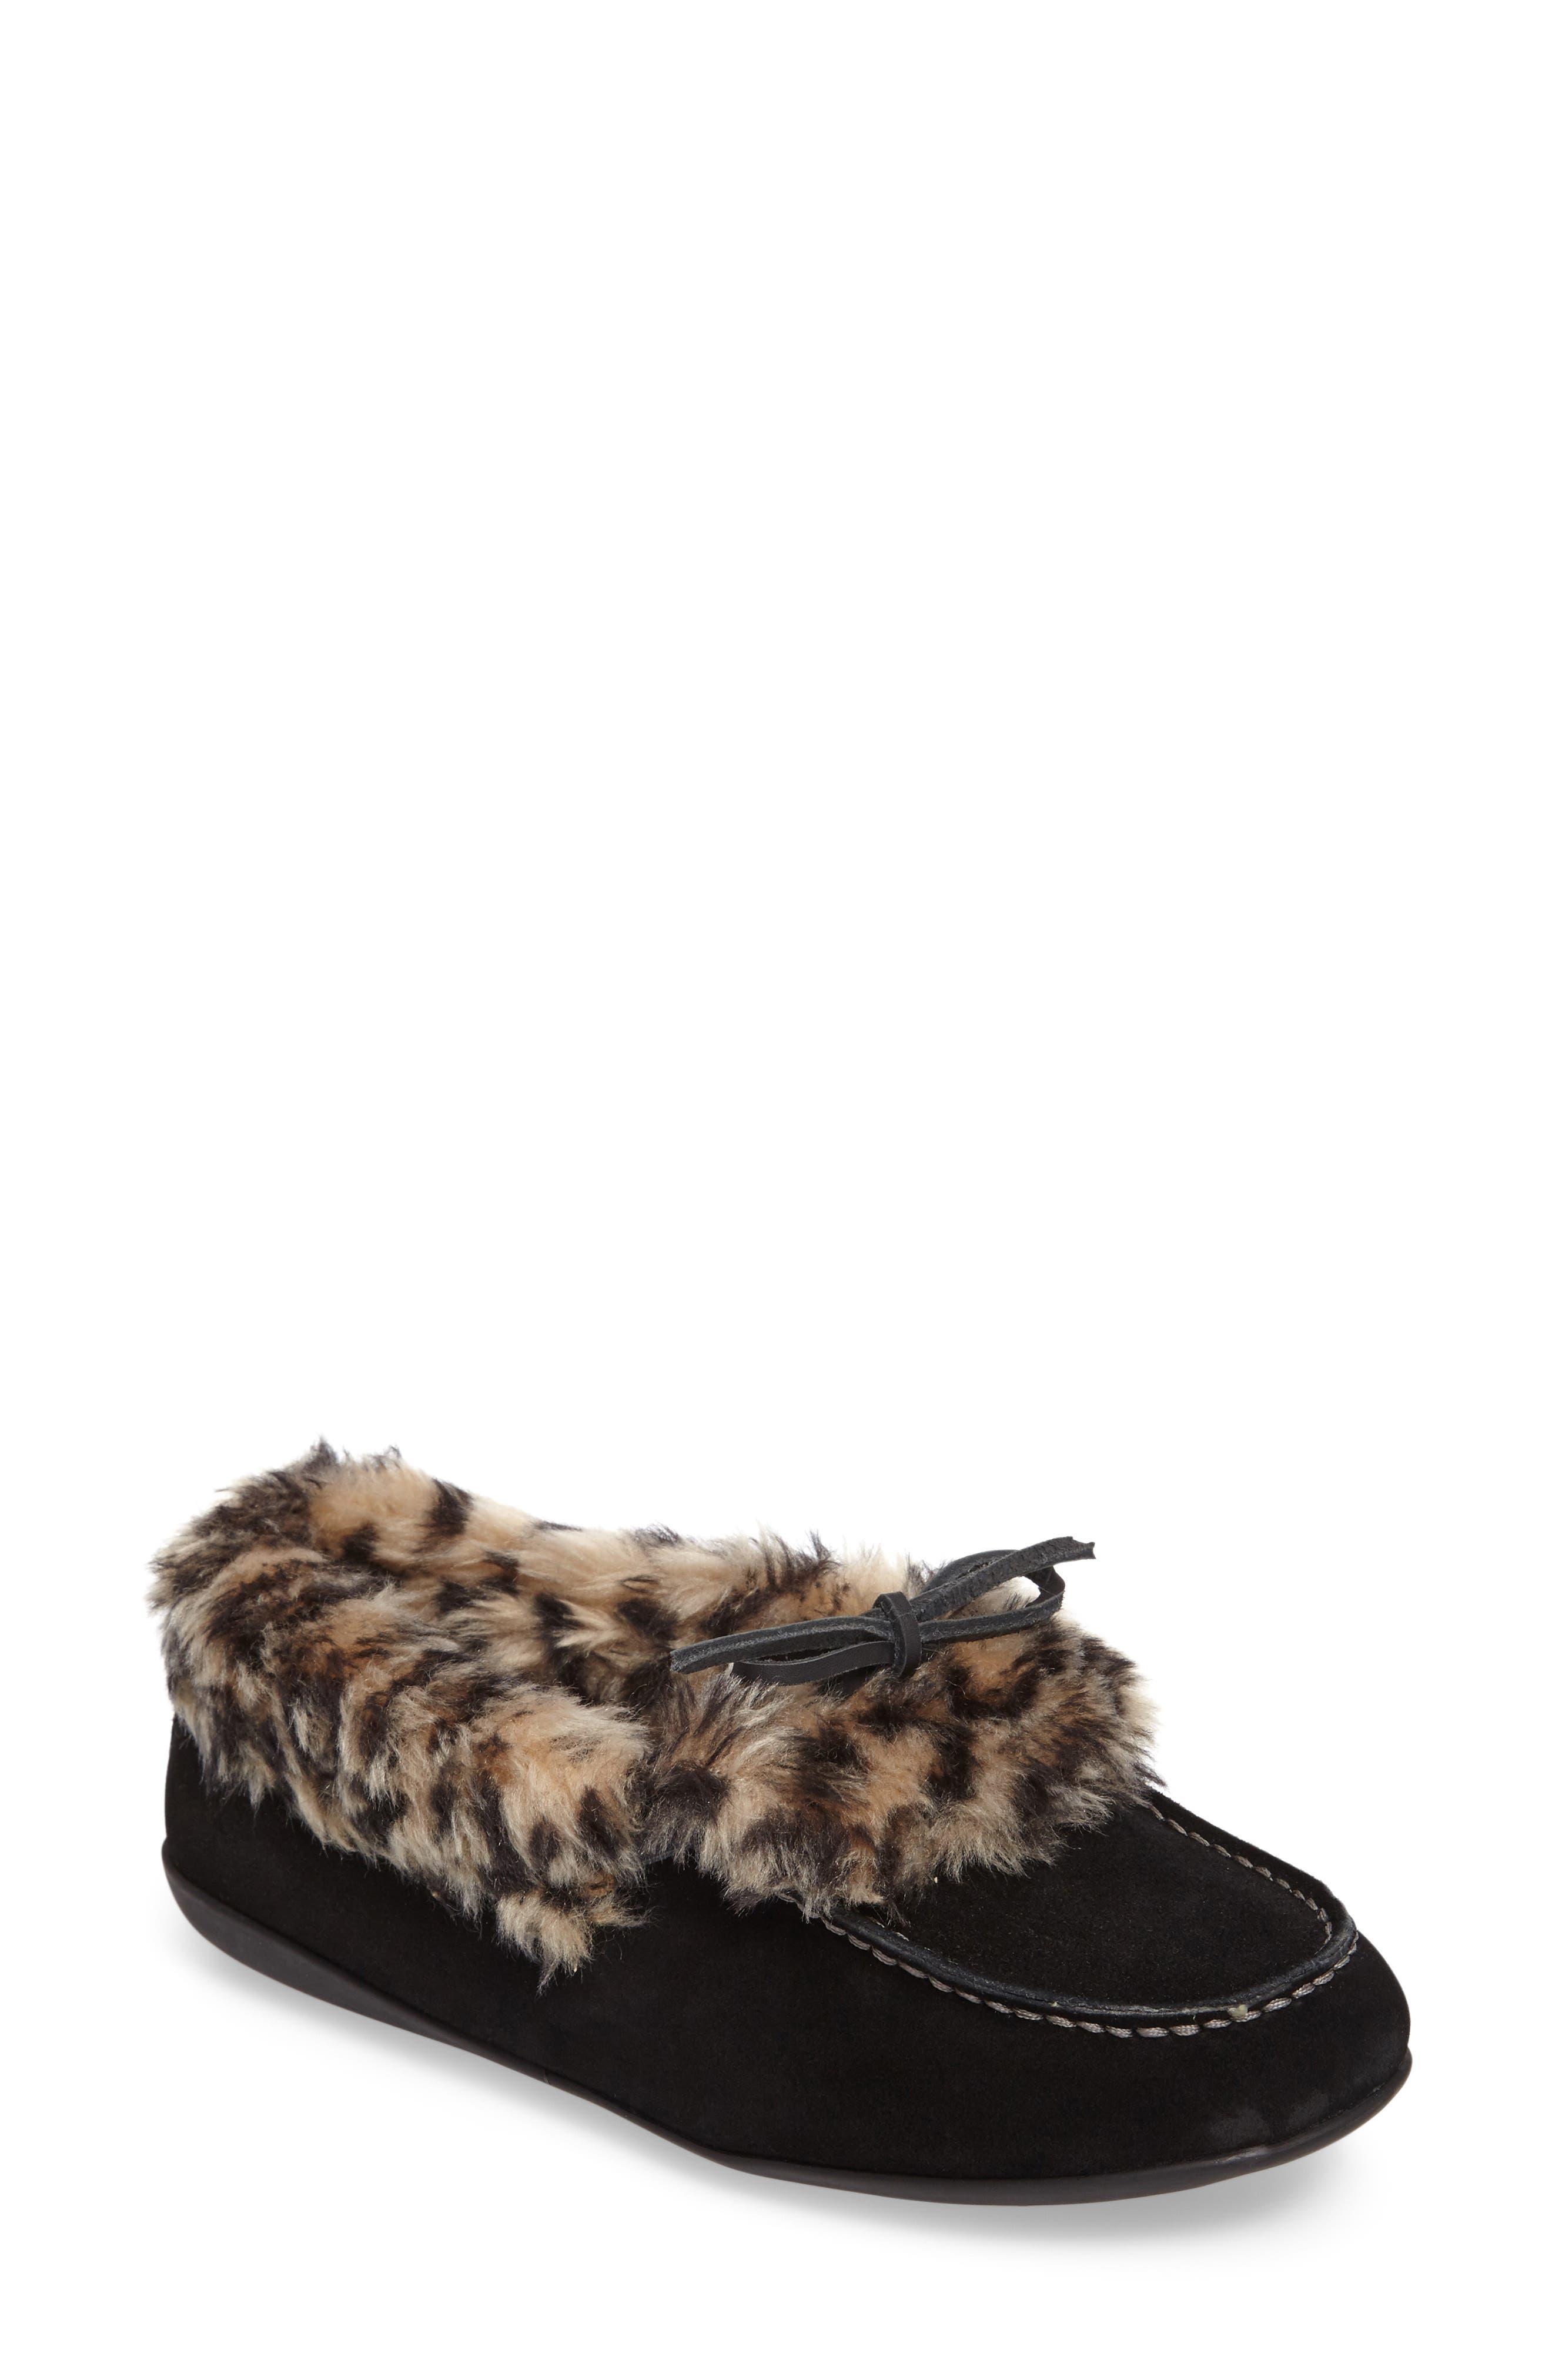 Juniper Faux Fur Slipper,                             Main thumbnail 3, color,